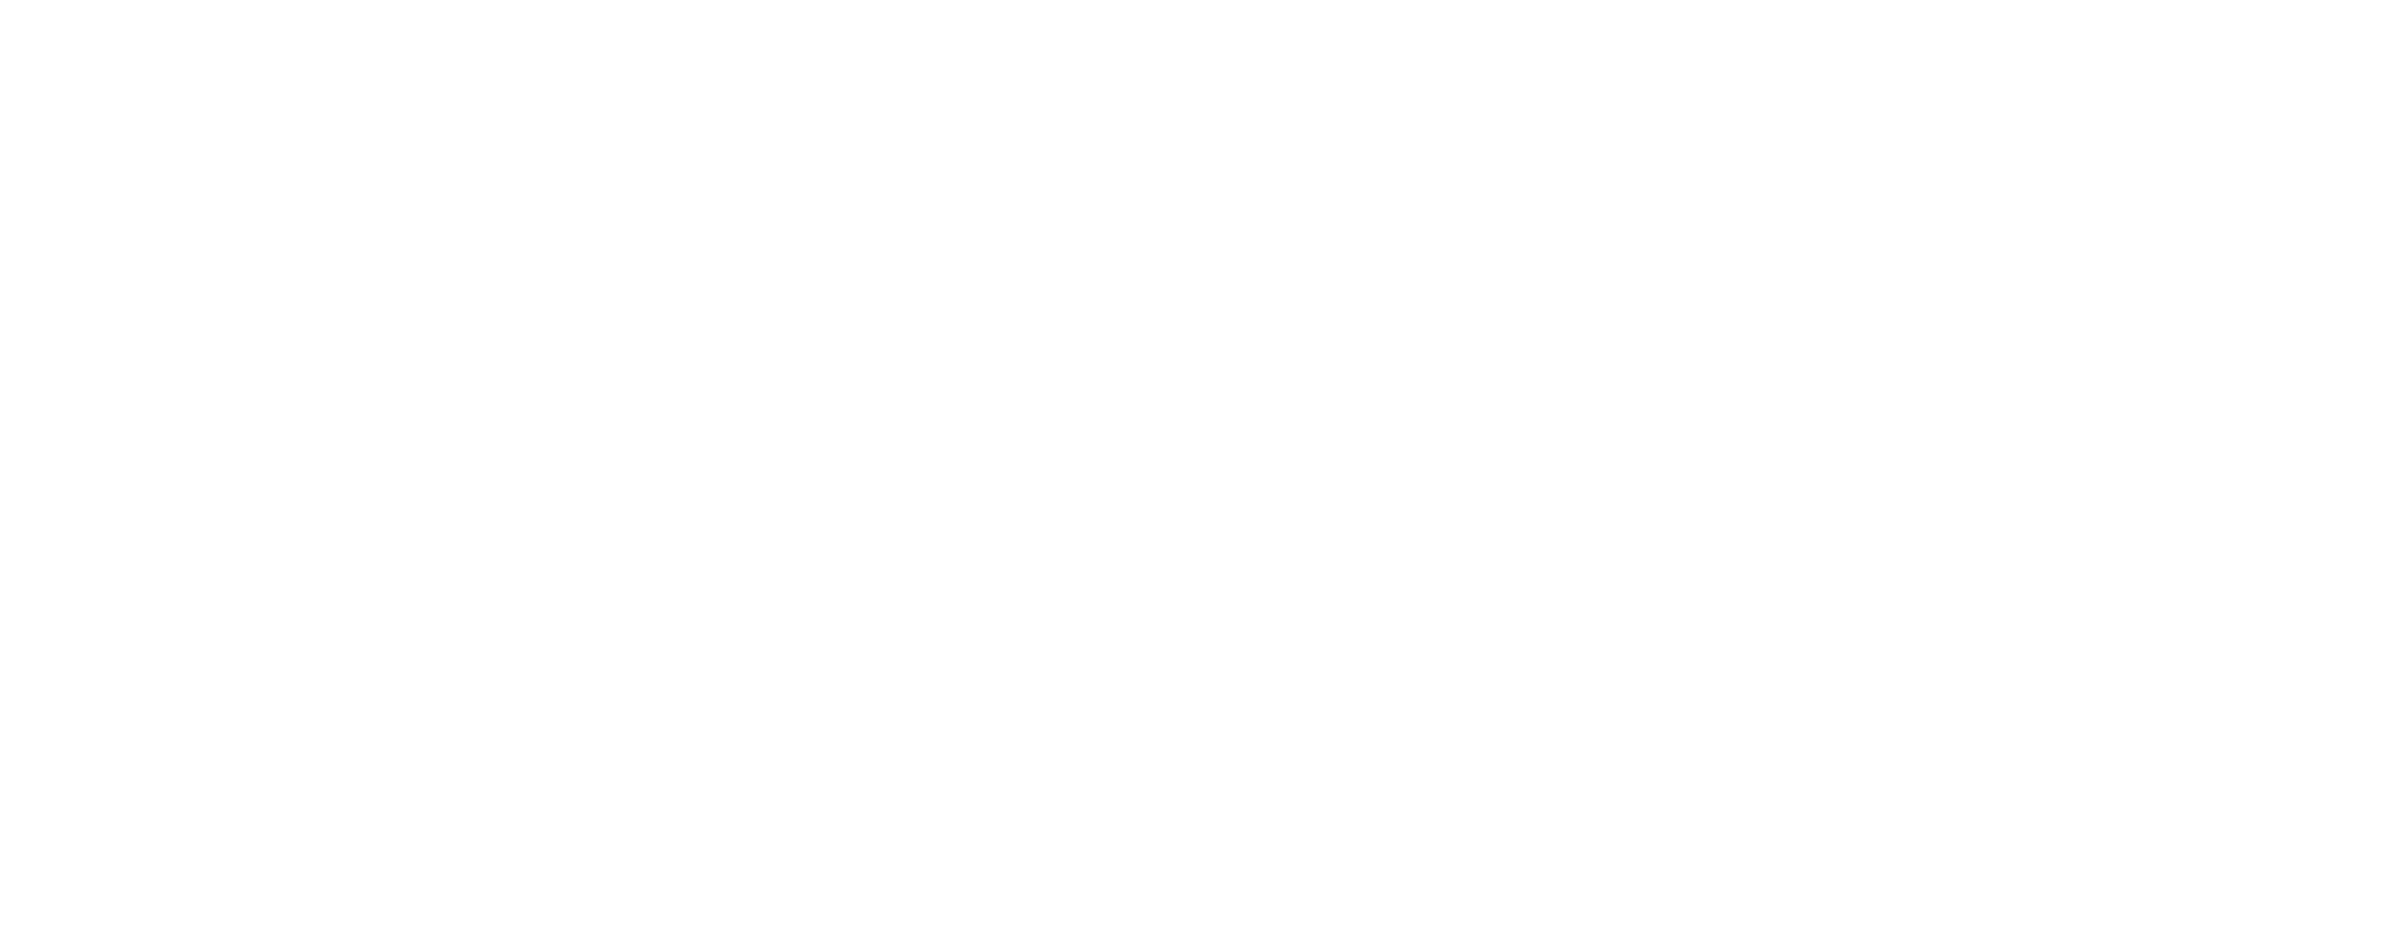 header-overlay-empty